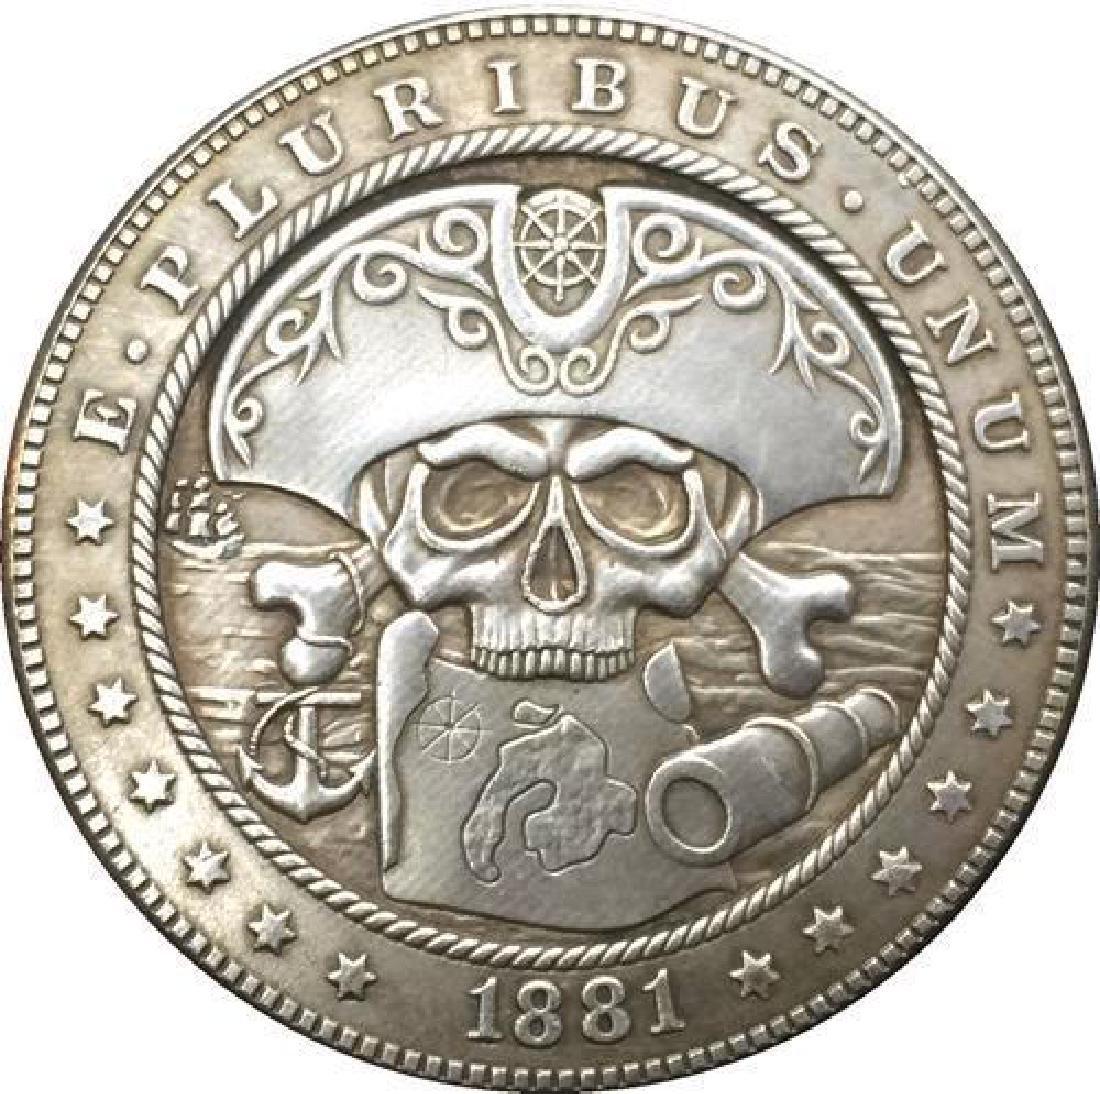 1881 USA Captain Pirate Skull Coin